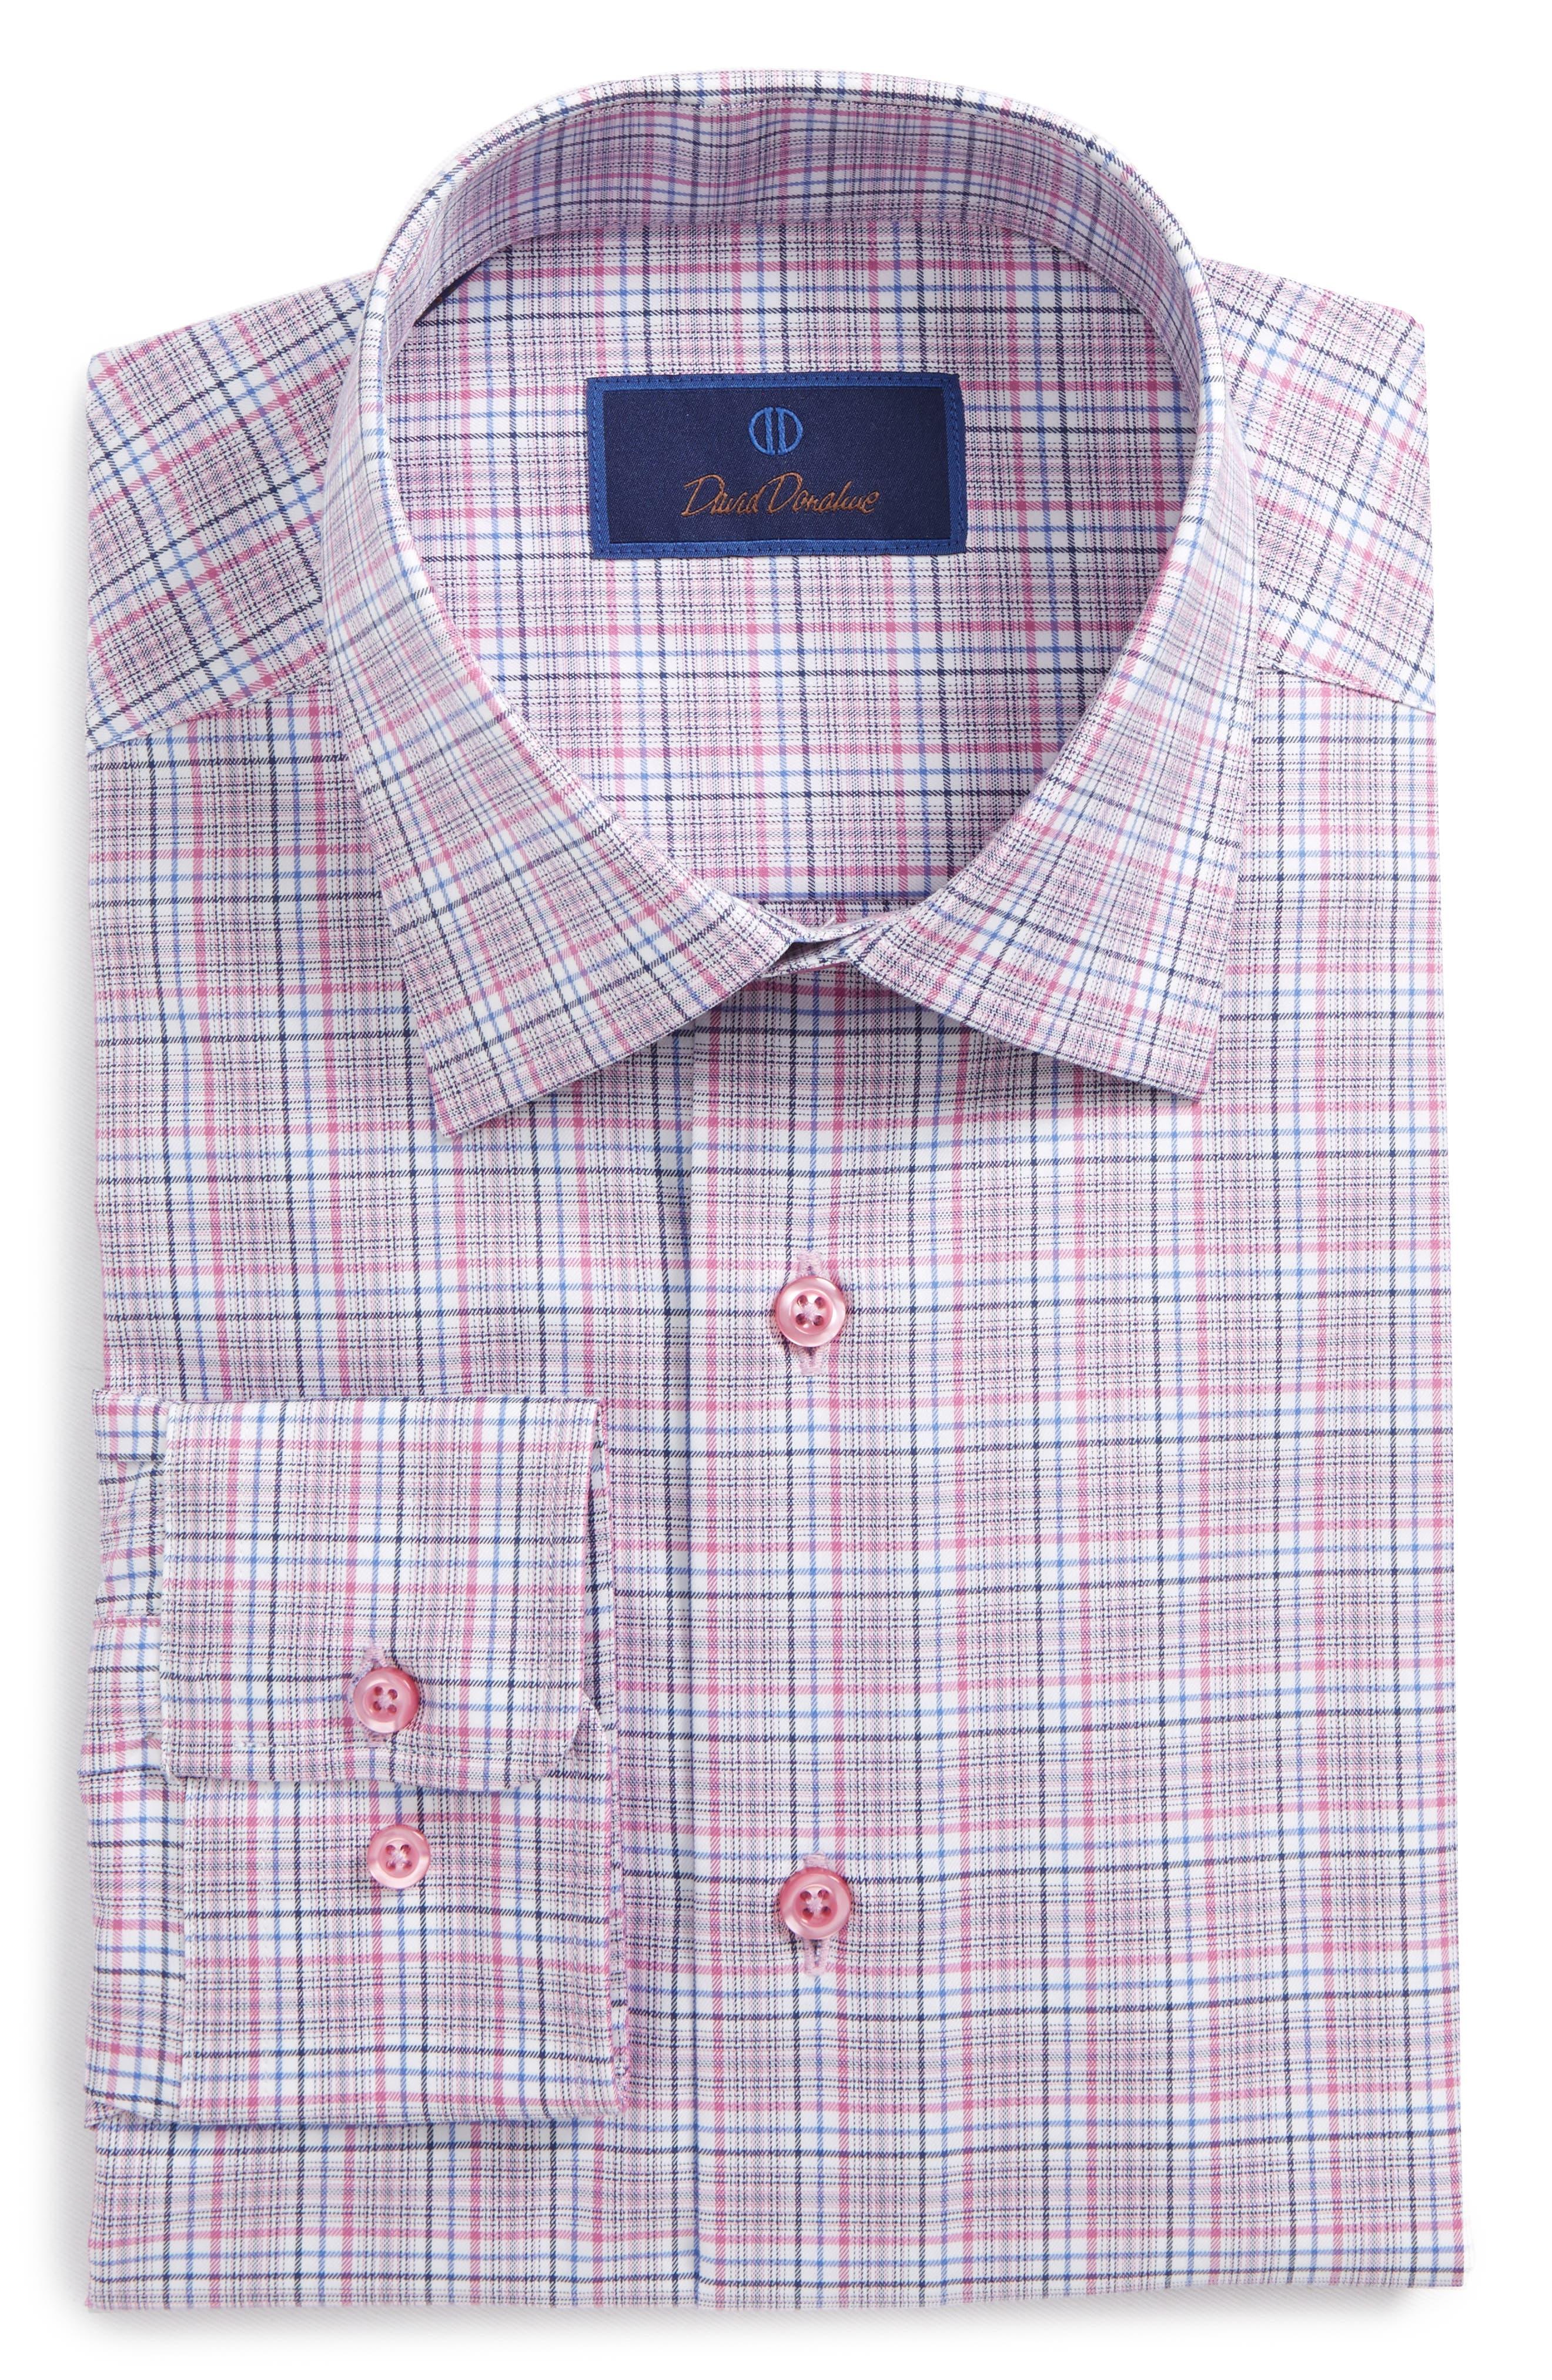 Regular Fit Plaid Dress Shirt,                             Main thumbnail 1, color,                             652